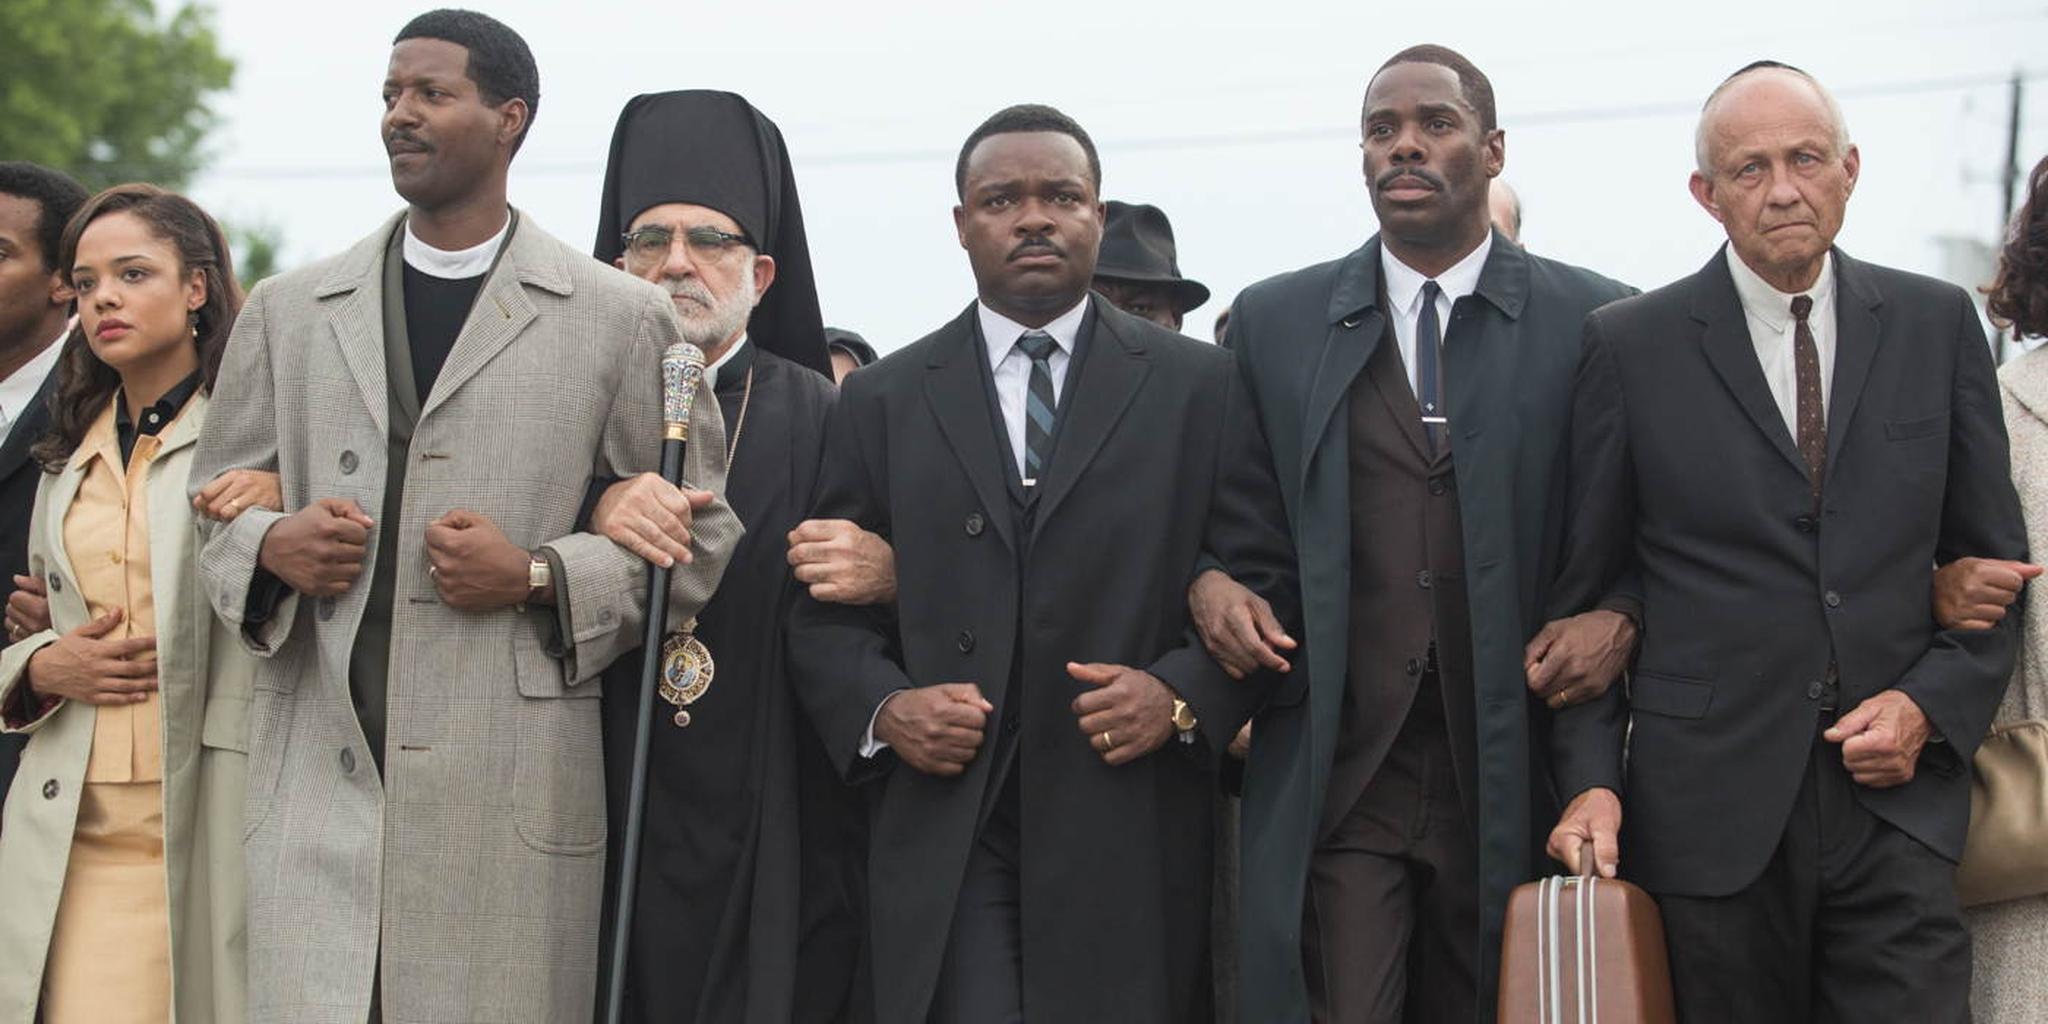 Cast of Selma